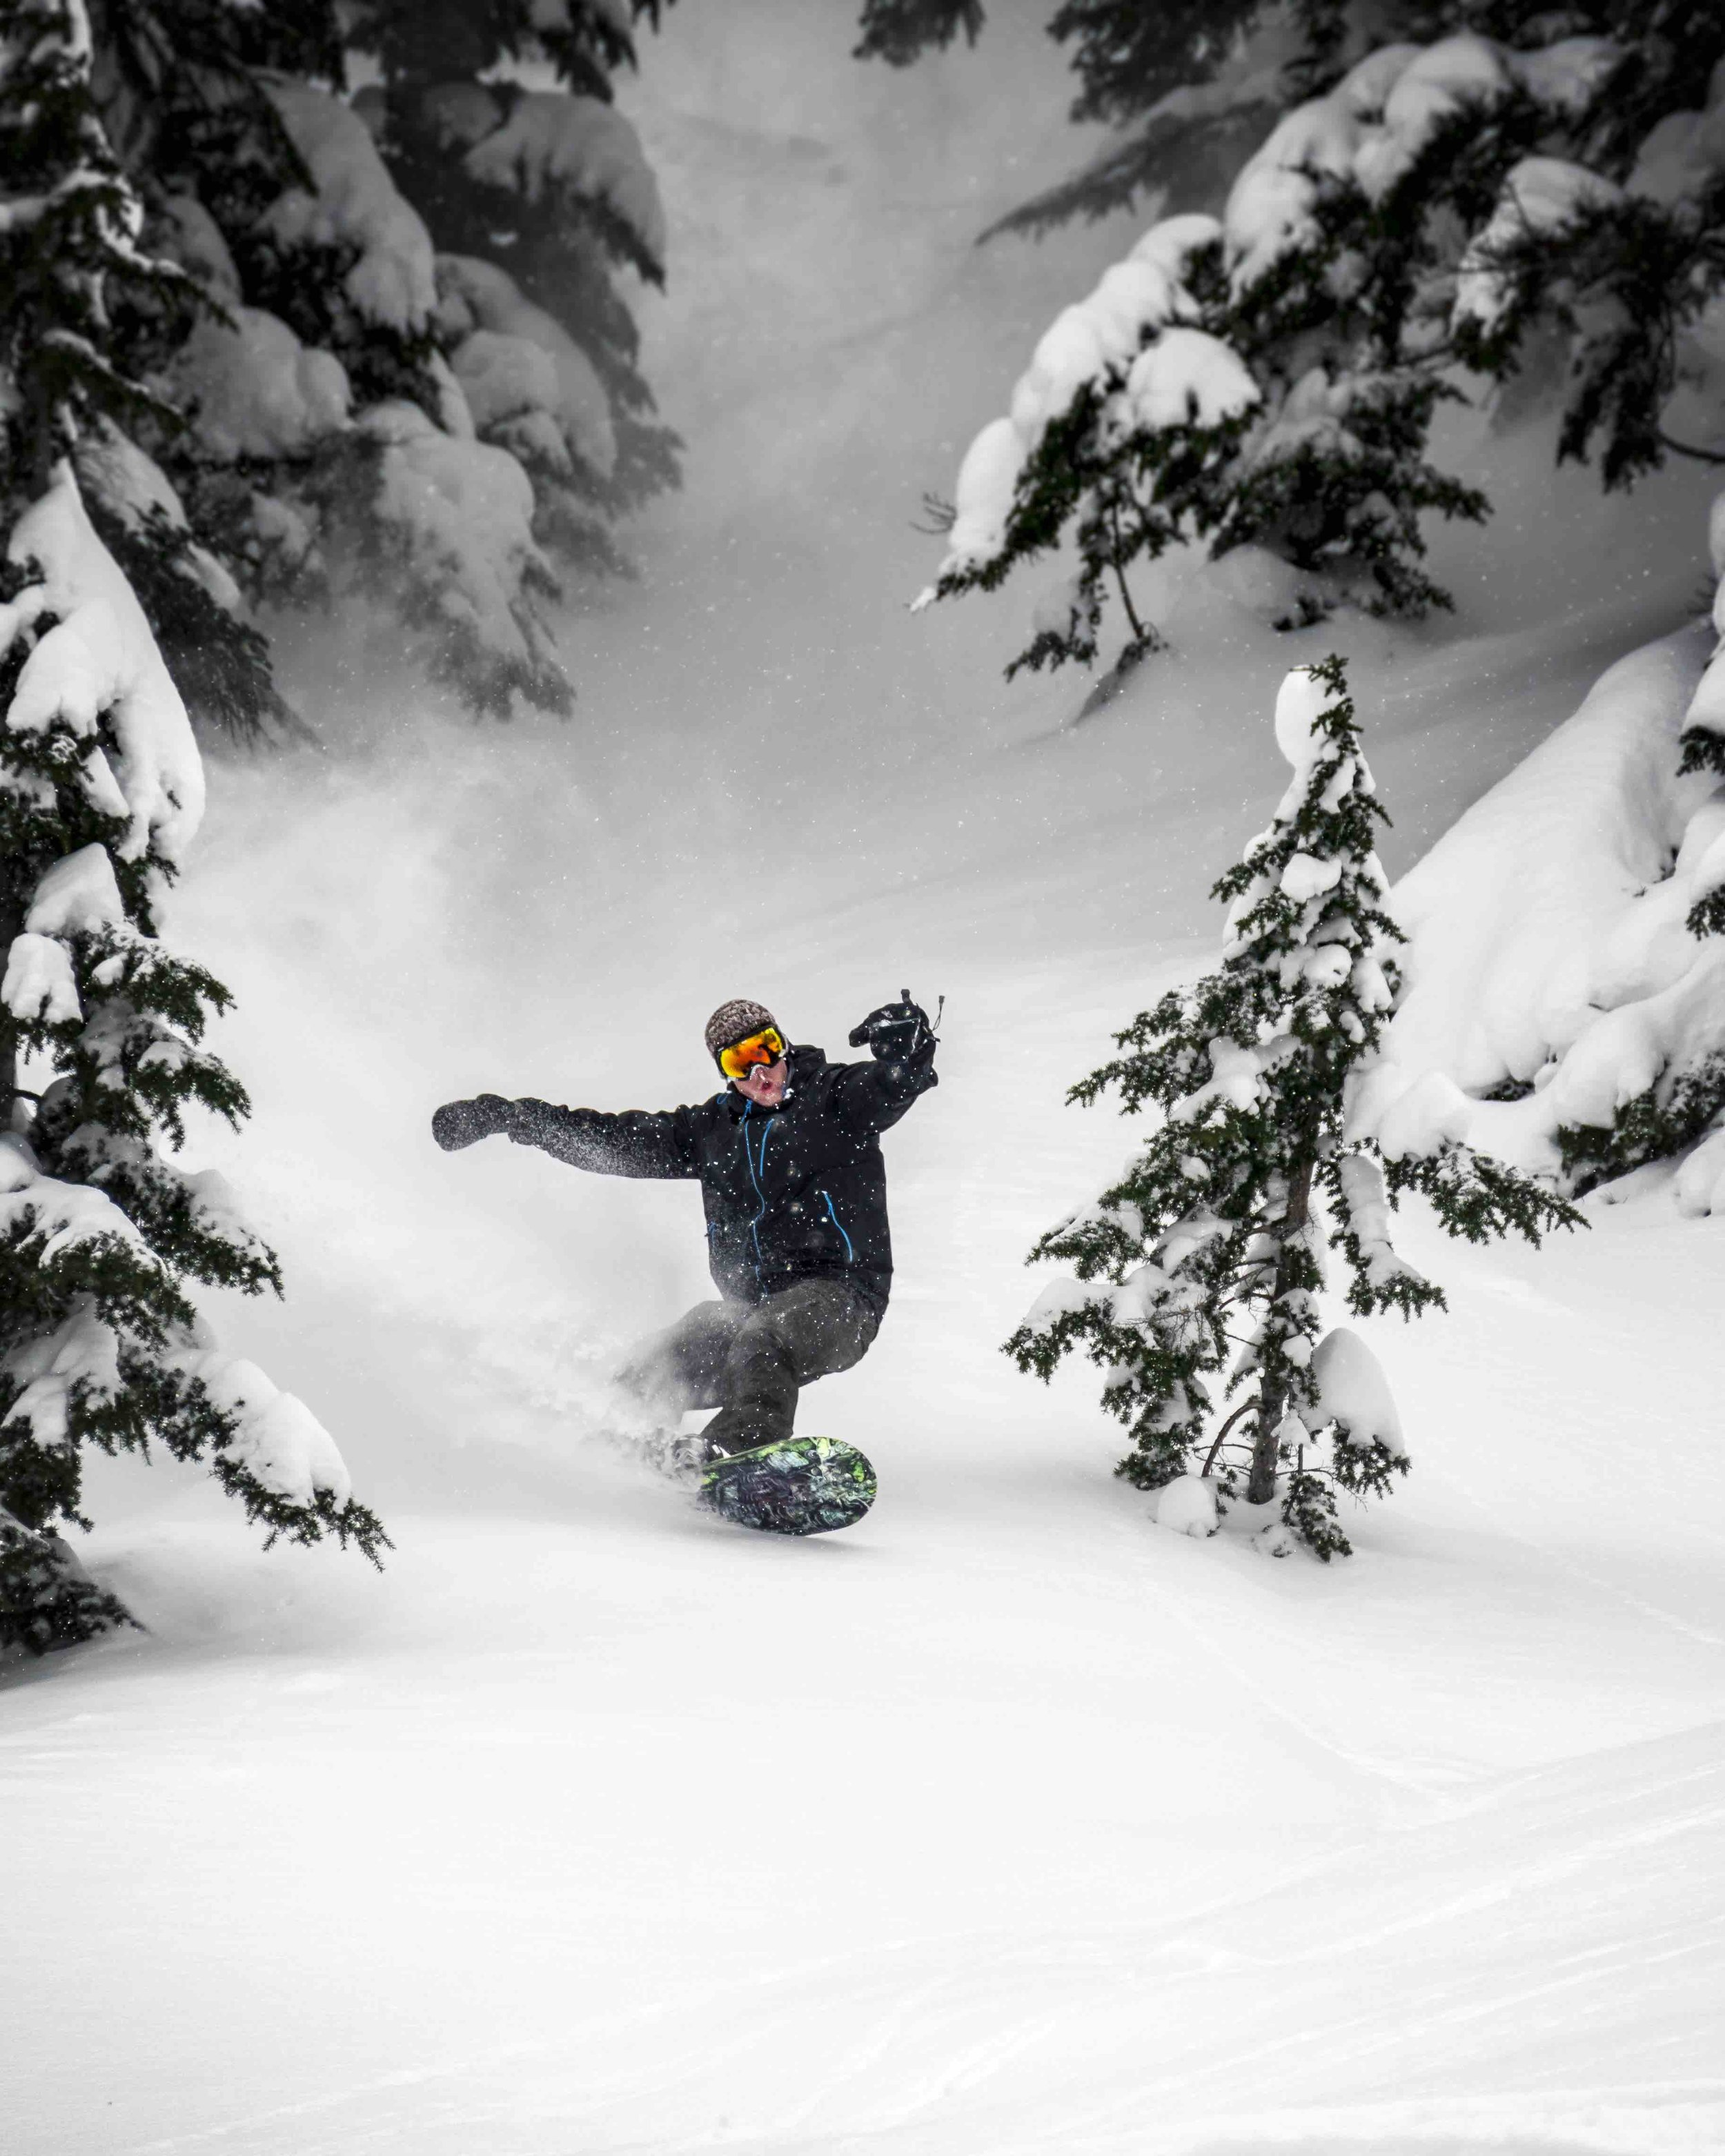 Snowboarder_Carving_Fresh_Powder_Spray_Through_Trees.jpeg